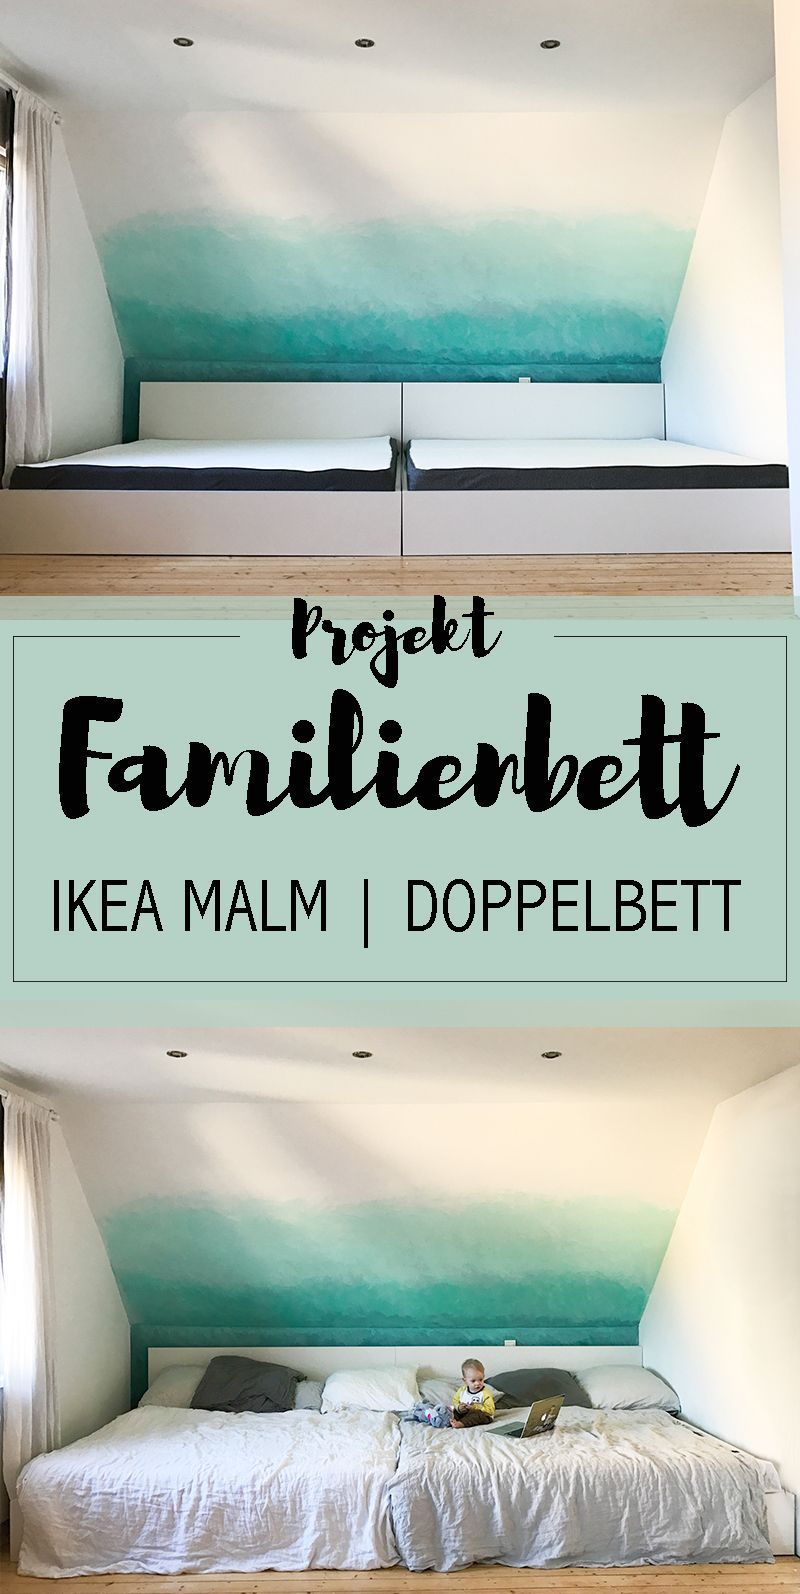 Schon Familienbett Hack XXL Familienbett Doppelbett Ikea MALM Tricks Tipps Fazit  Emma Matratze Weißes Bett Modern Scandi